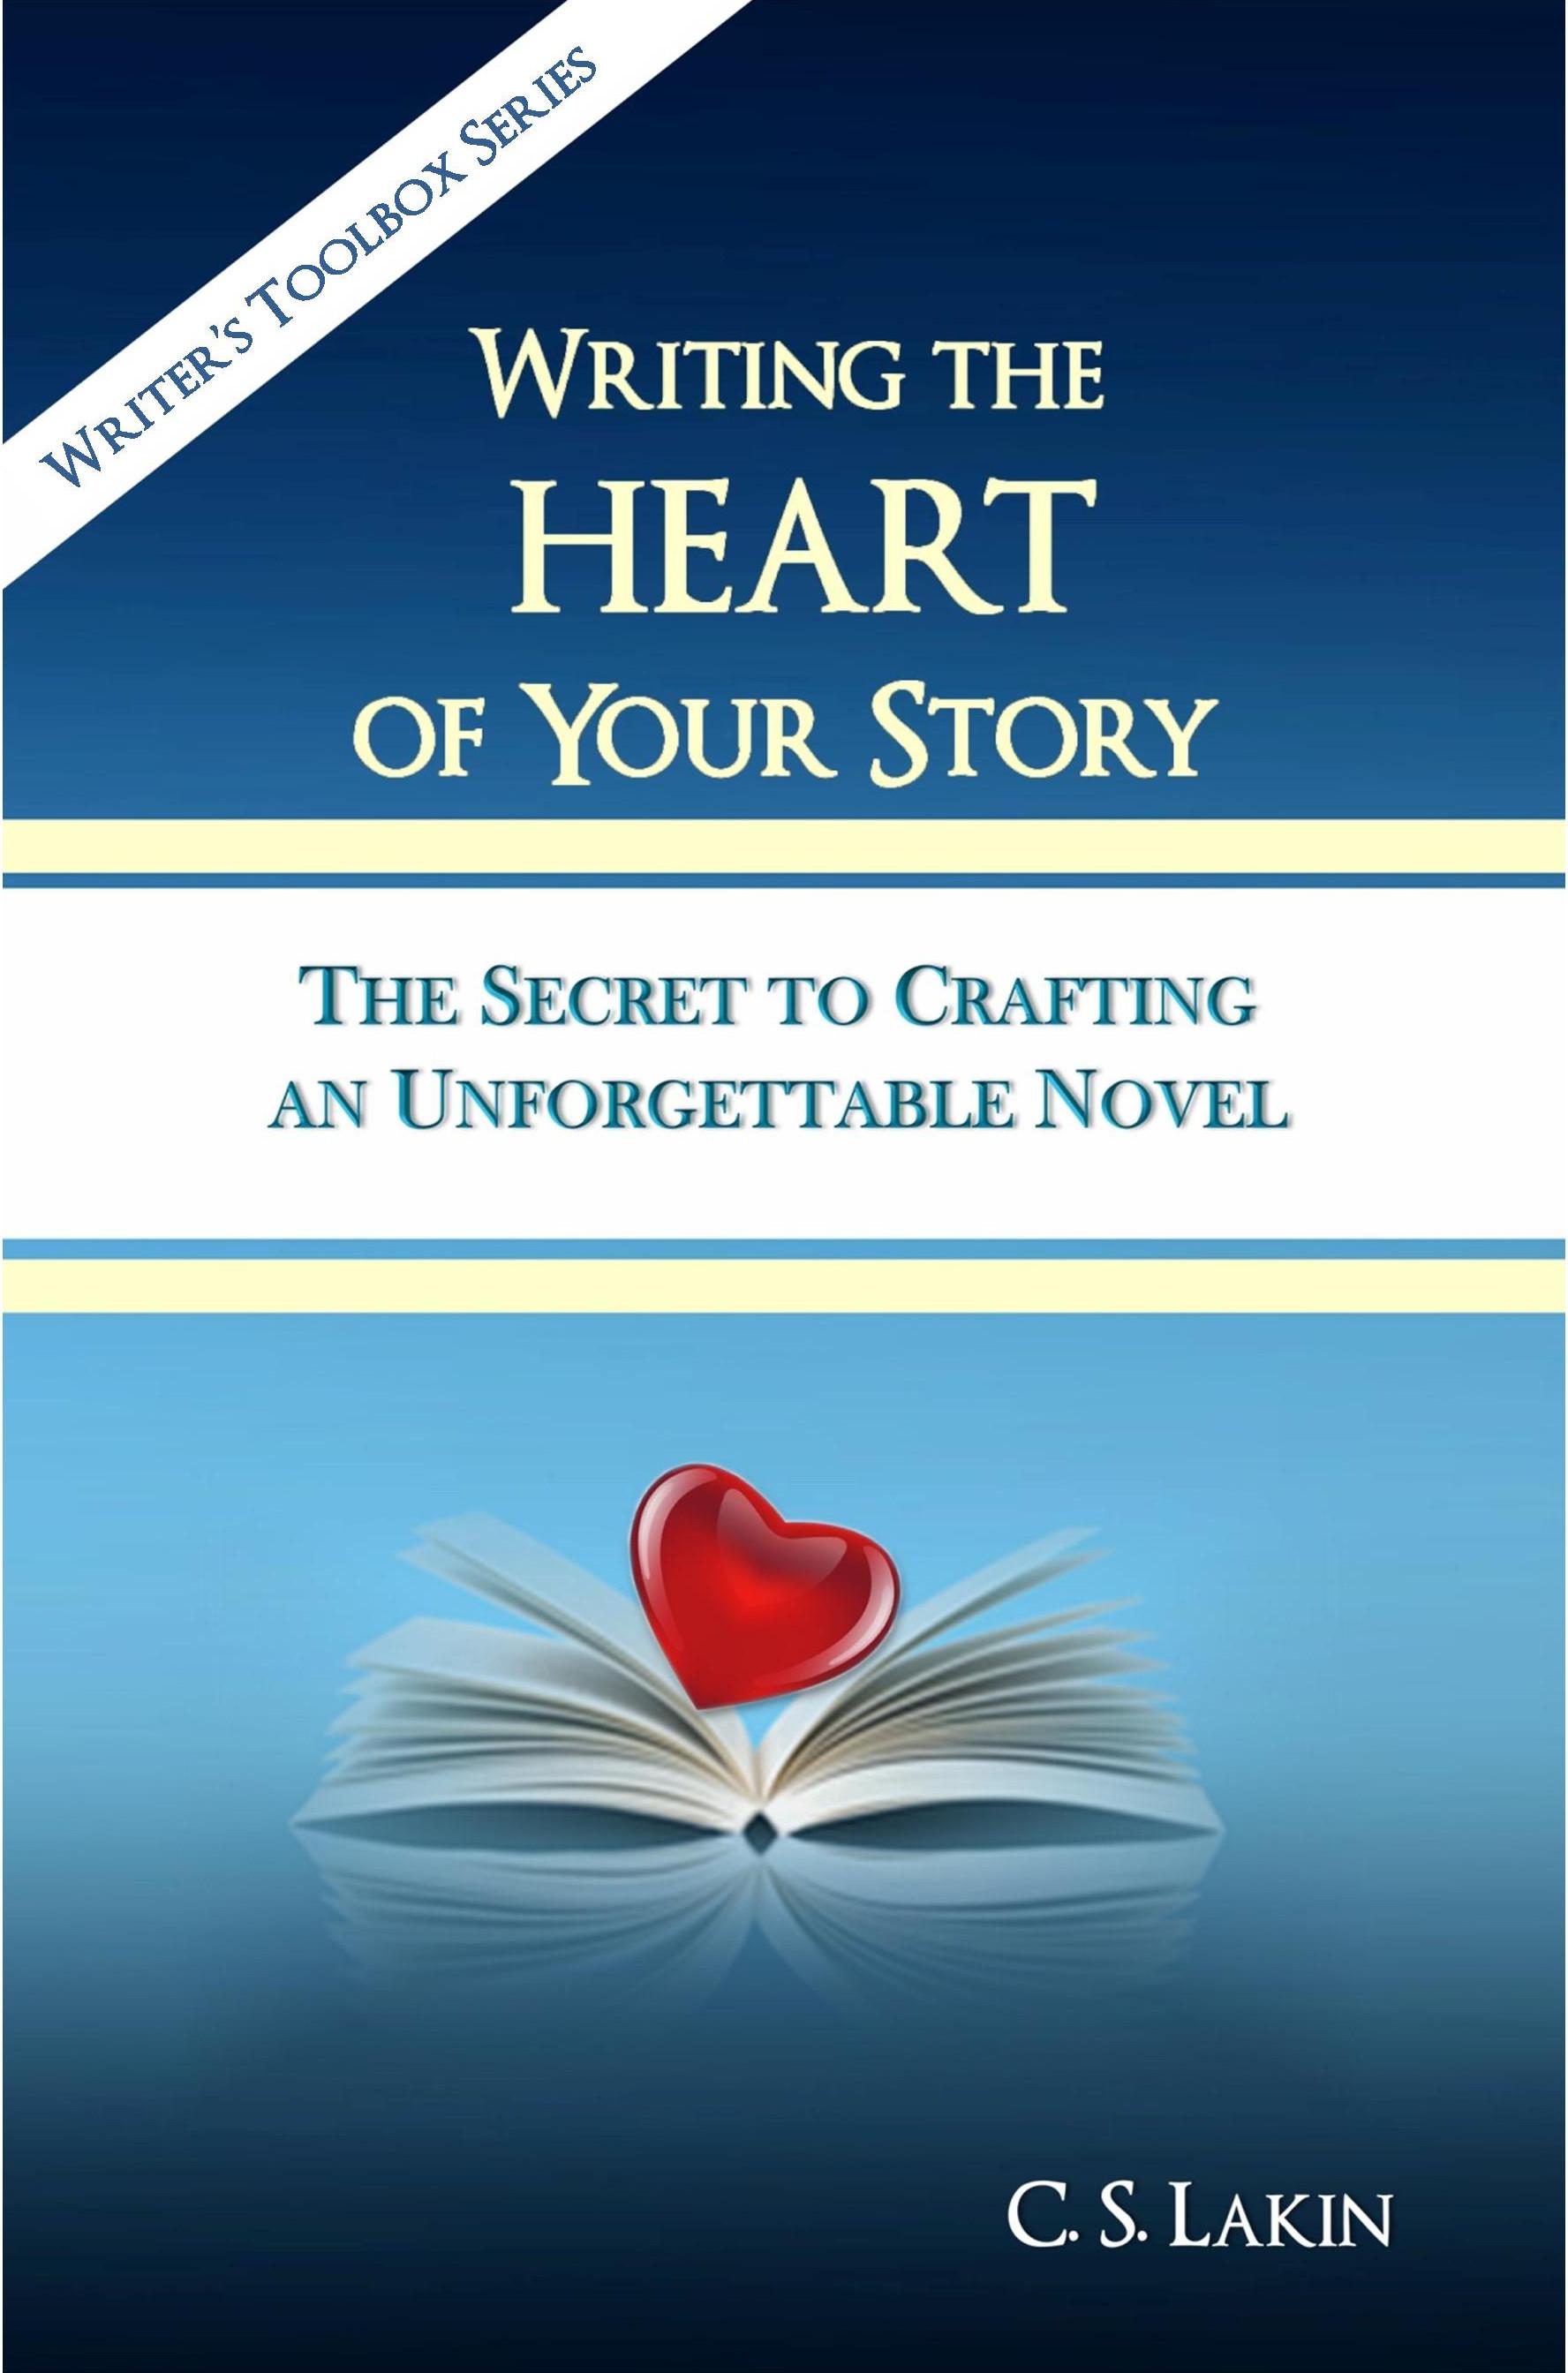 https://i1.wp.com/writershelpingwriters.net/wp-content/uploads/2014/03/heartofyourstory.jpg